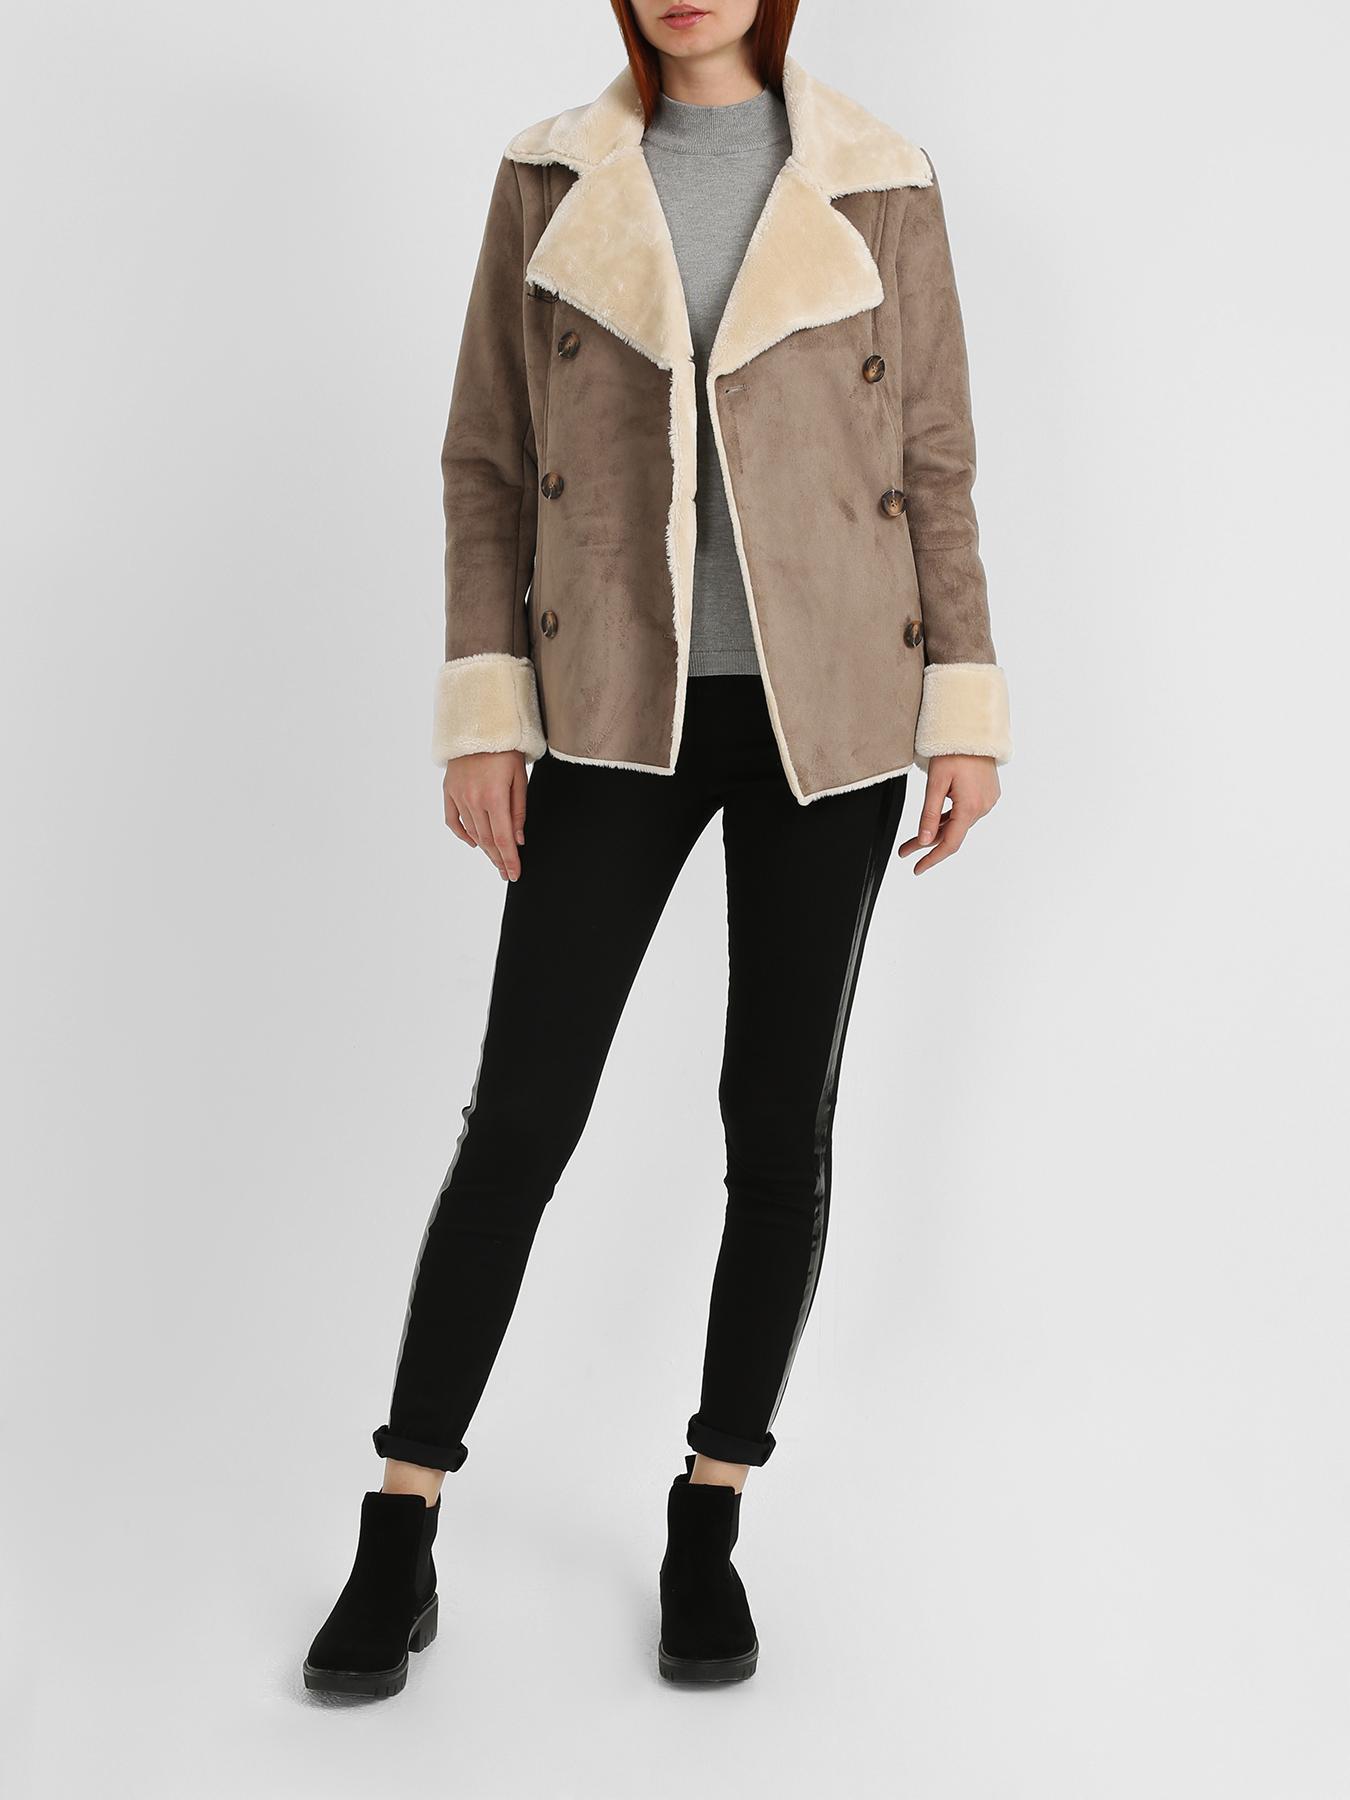 Куртка 6 P.M. Женская дубленка 12storeez дубленка с лацканами бежевый